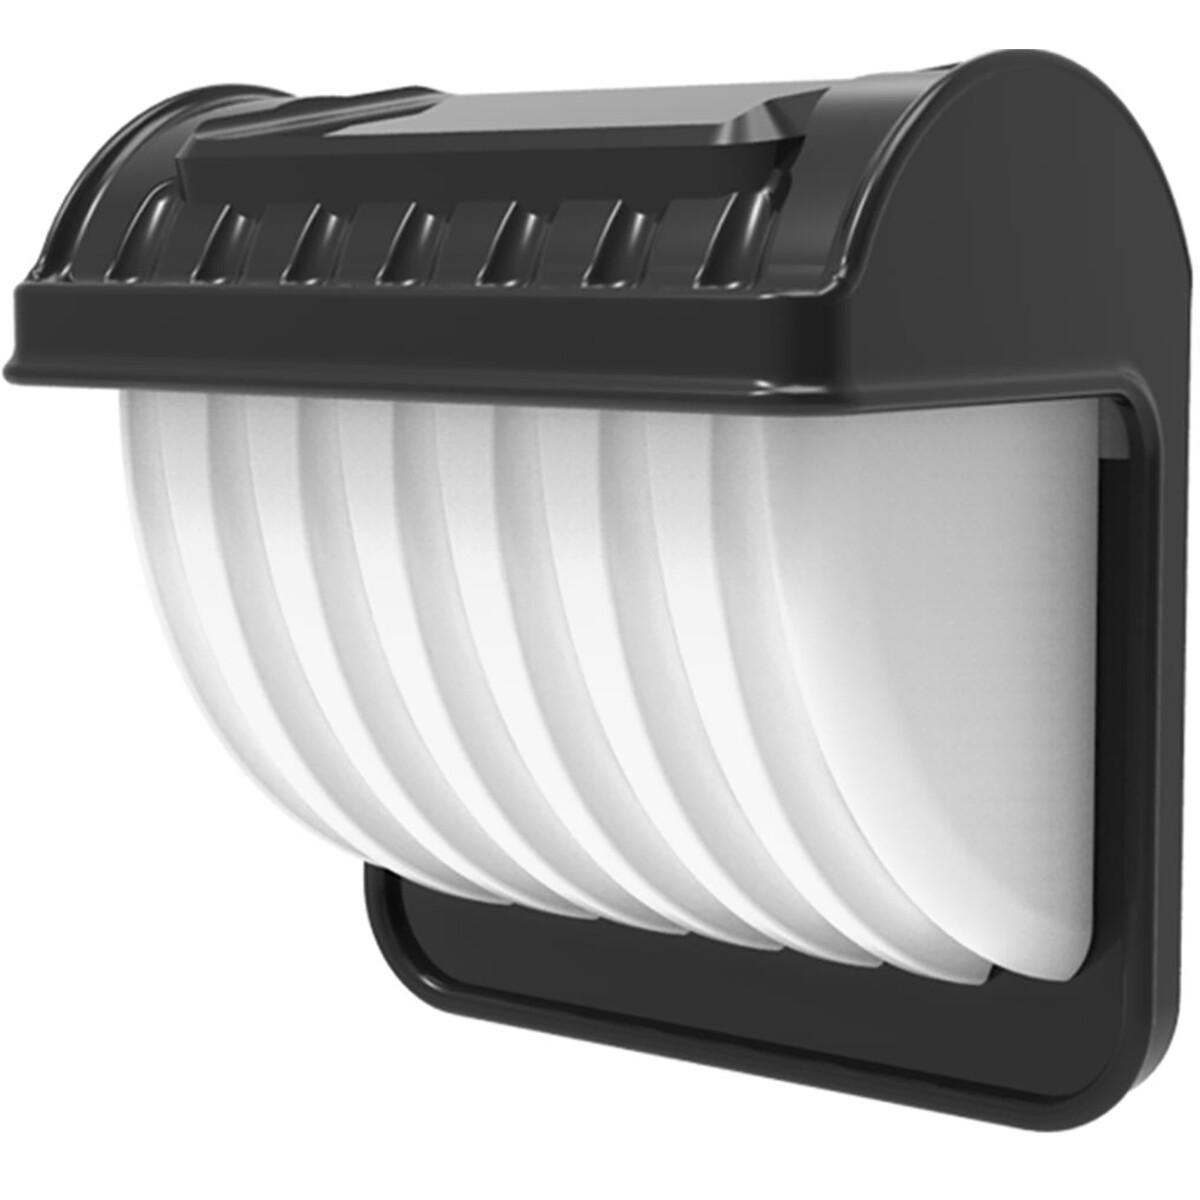 LED Tuinverlichting met Zonne-energie - Dag en Nacht Sensor - Wandlamp - Aigi Vunci - 0.12W - Helder